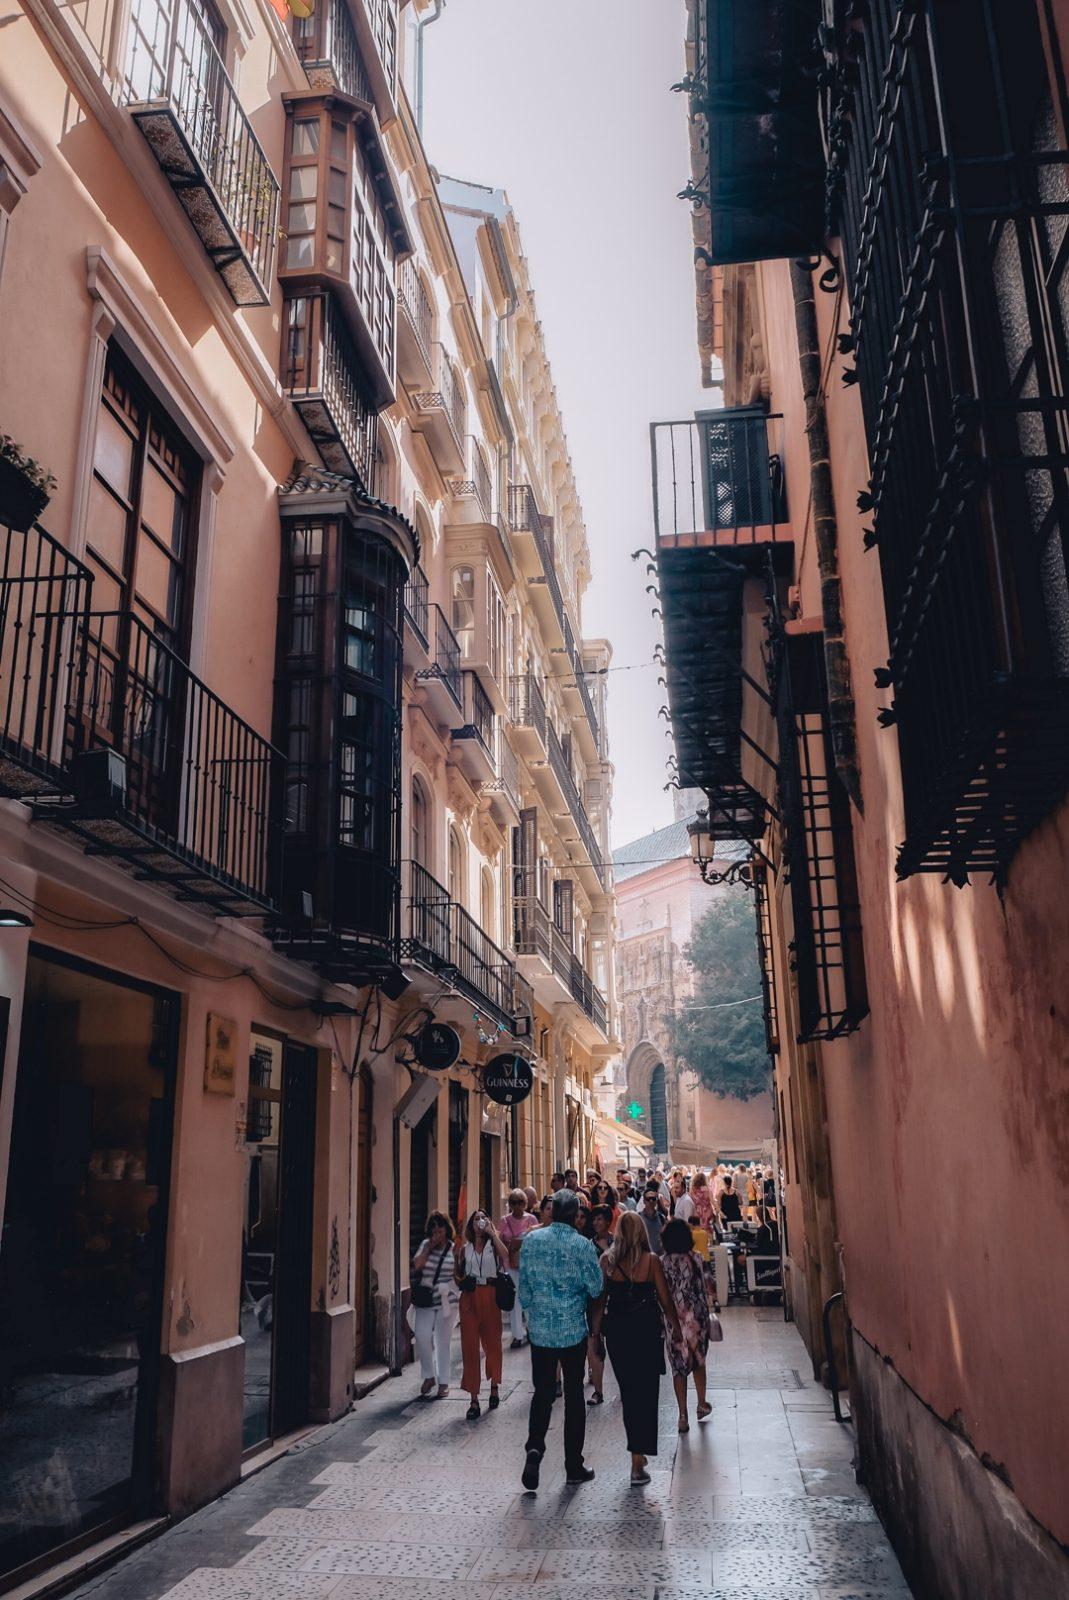 Cute tiny street in Malaga